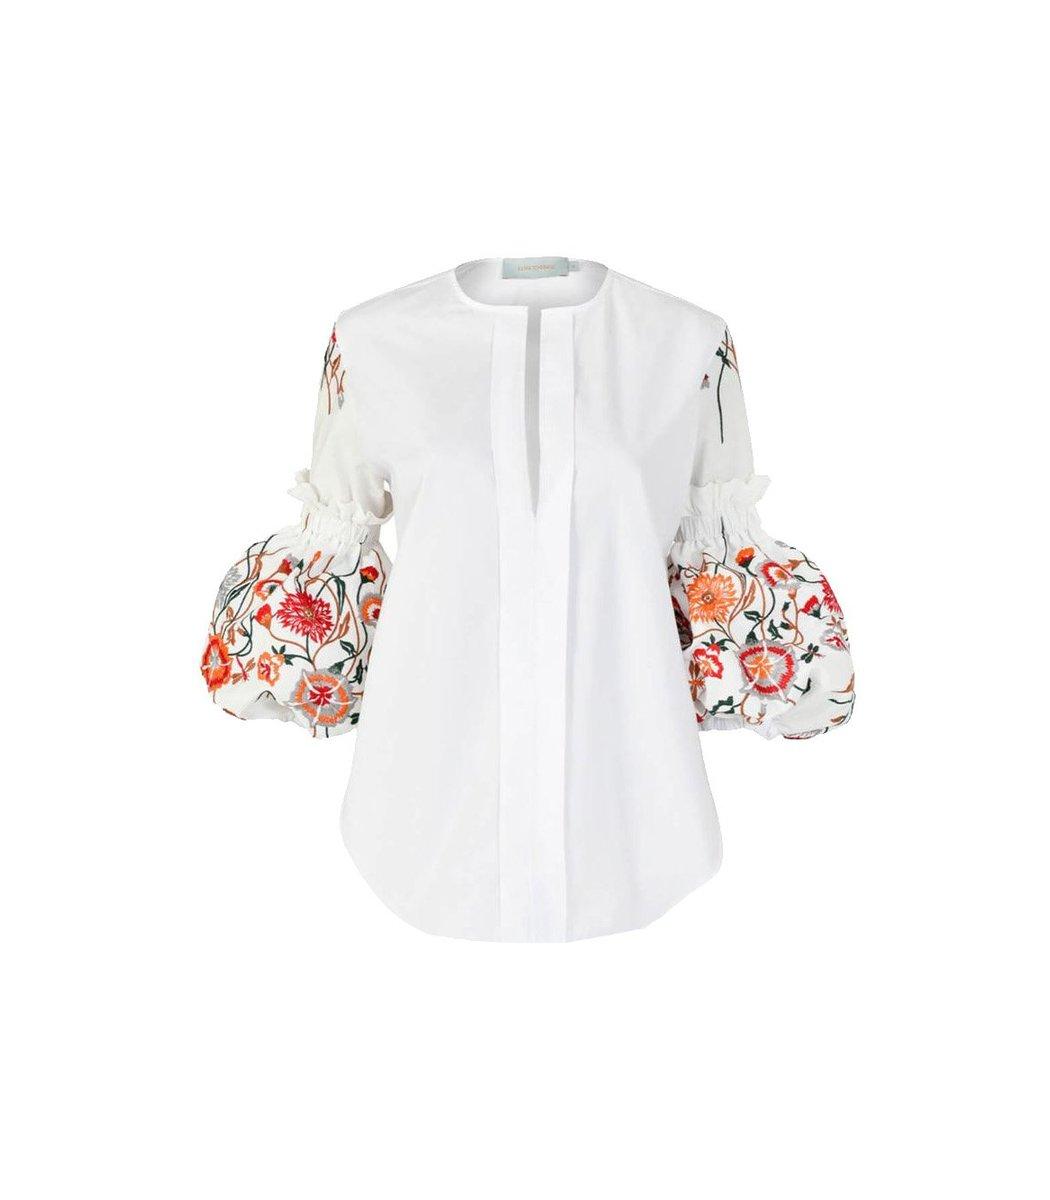 Silvia Tcherassi Clothing Lucaya Puff Sleeve Rose Embroidered shirt